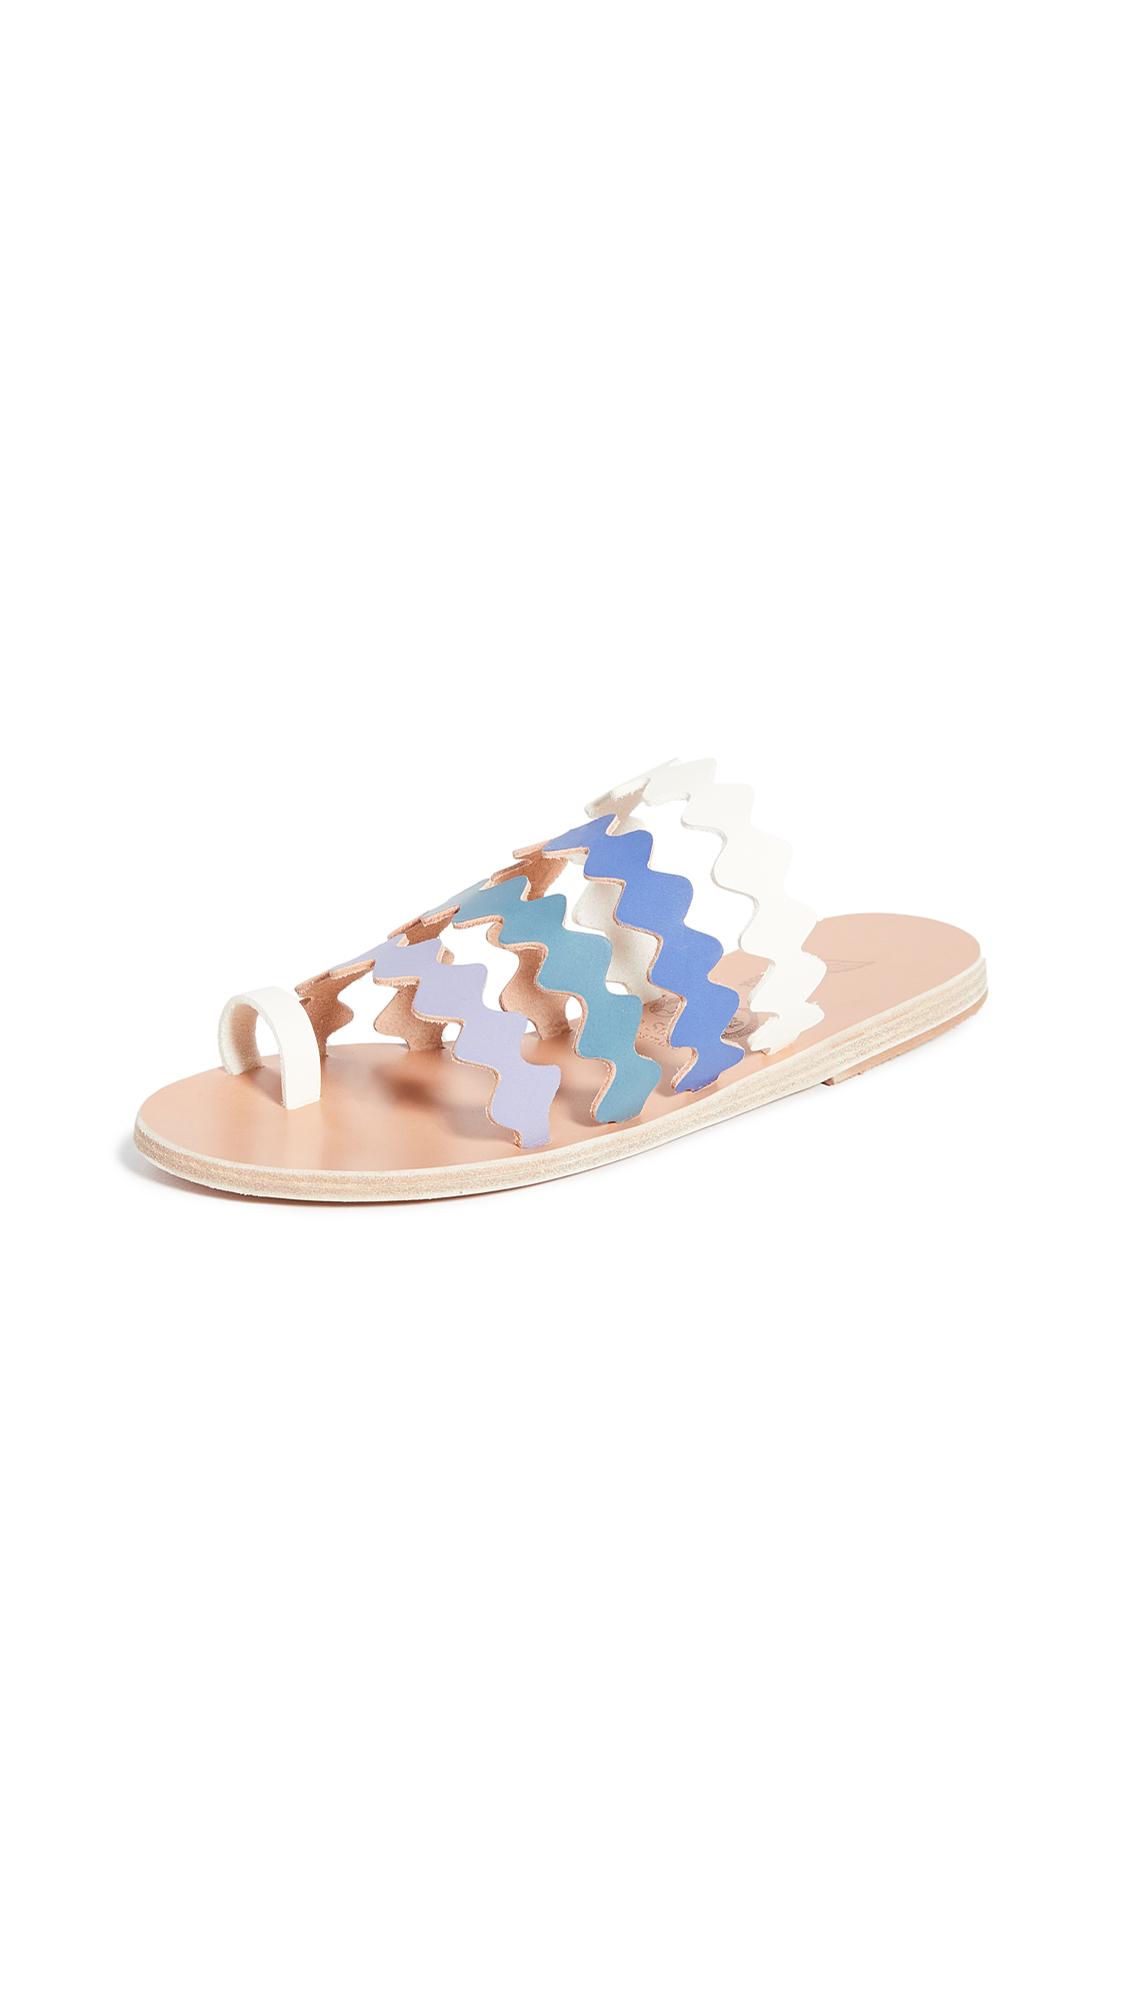 Buy Ancient Greek Sandals x Le Sirenuse Positano Niki Onda Sandals online, shop Ancient Greek Sandals